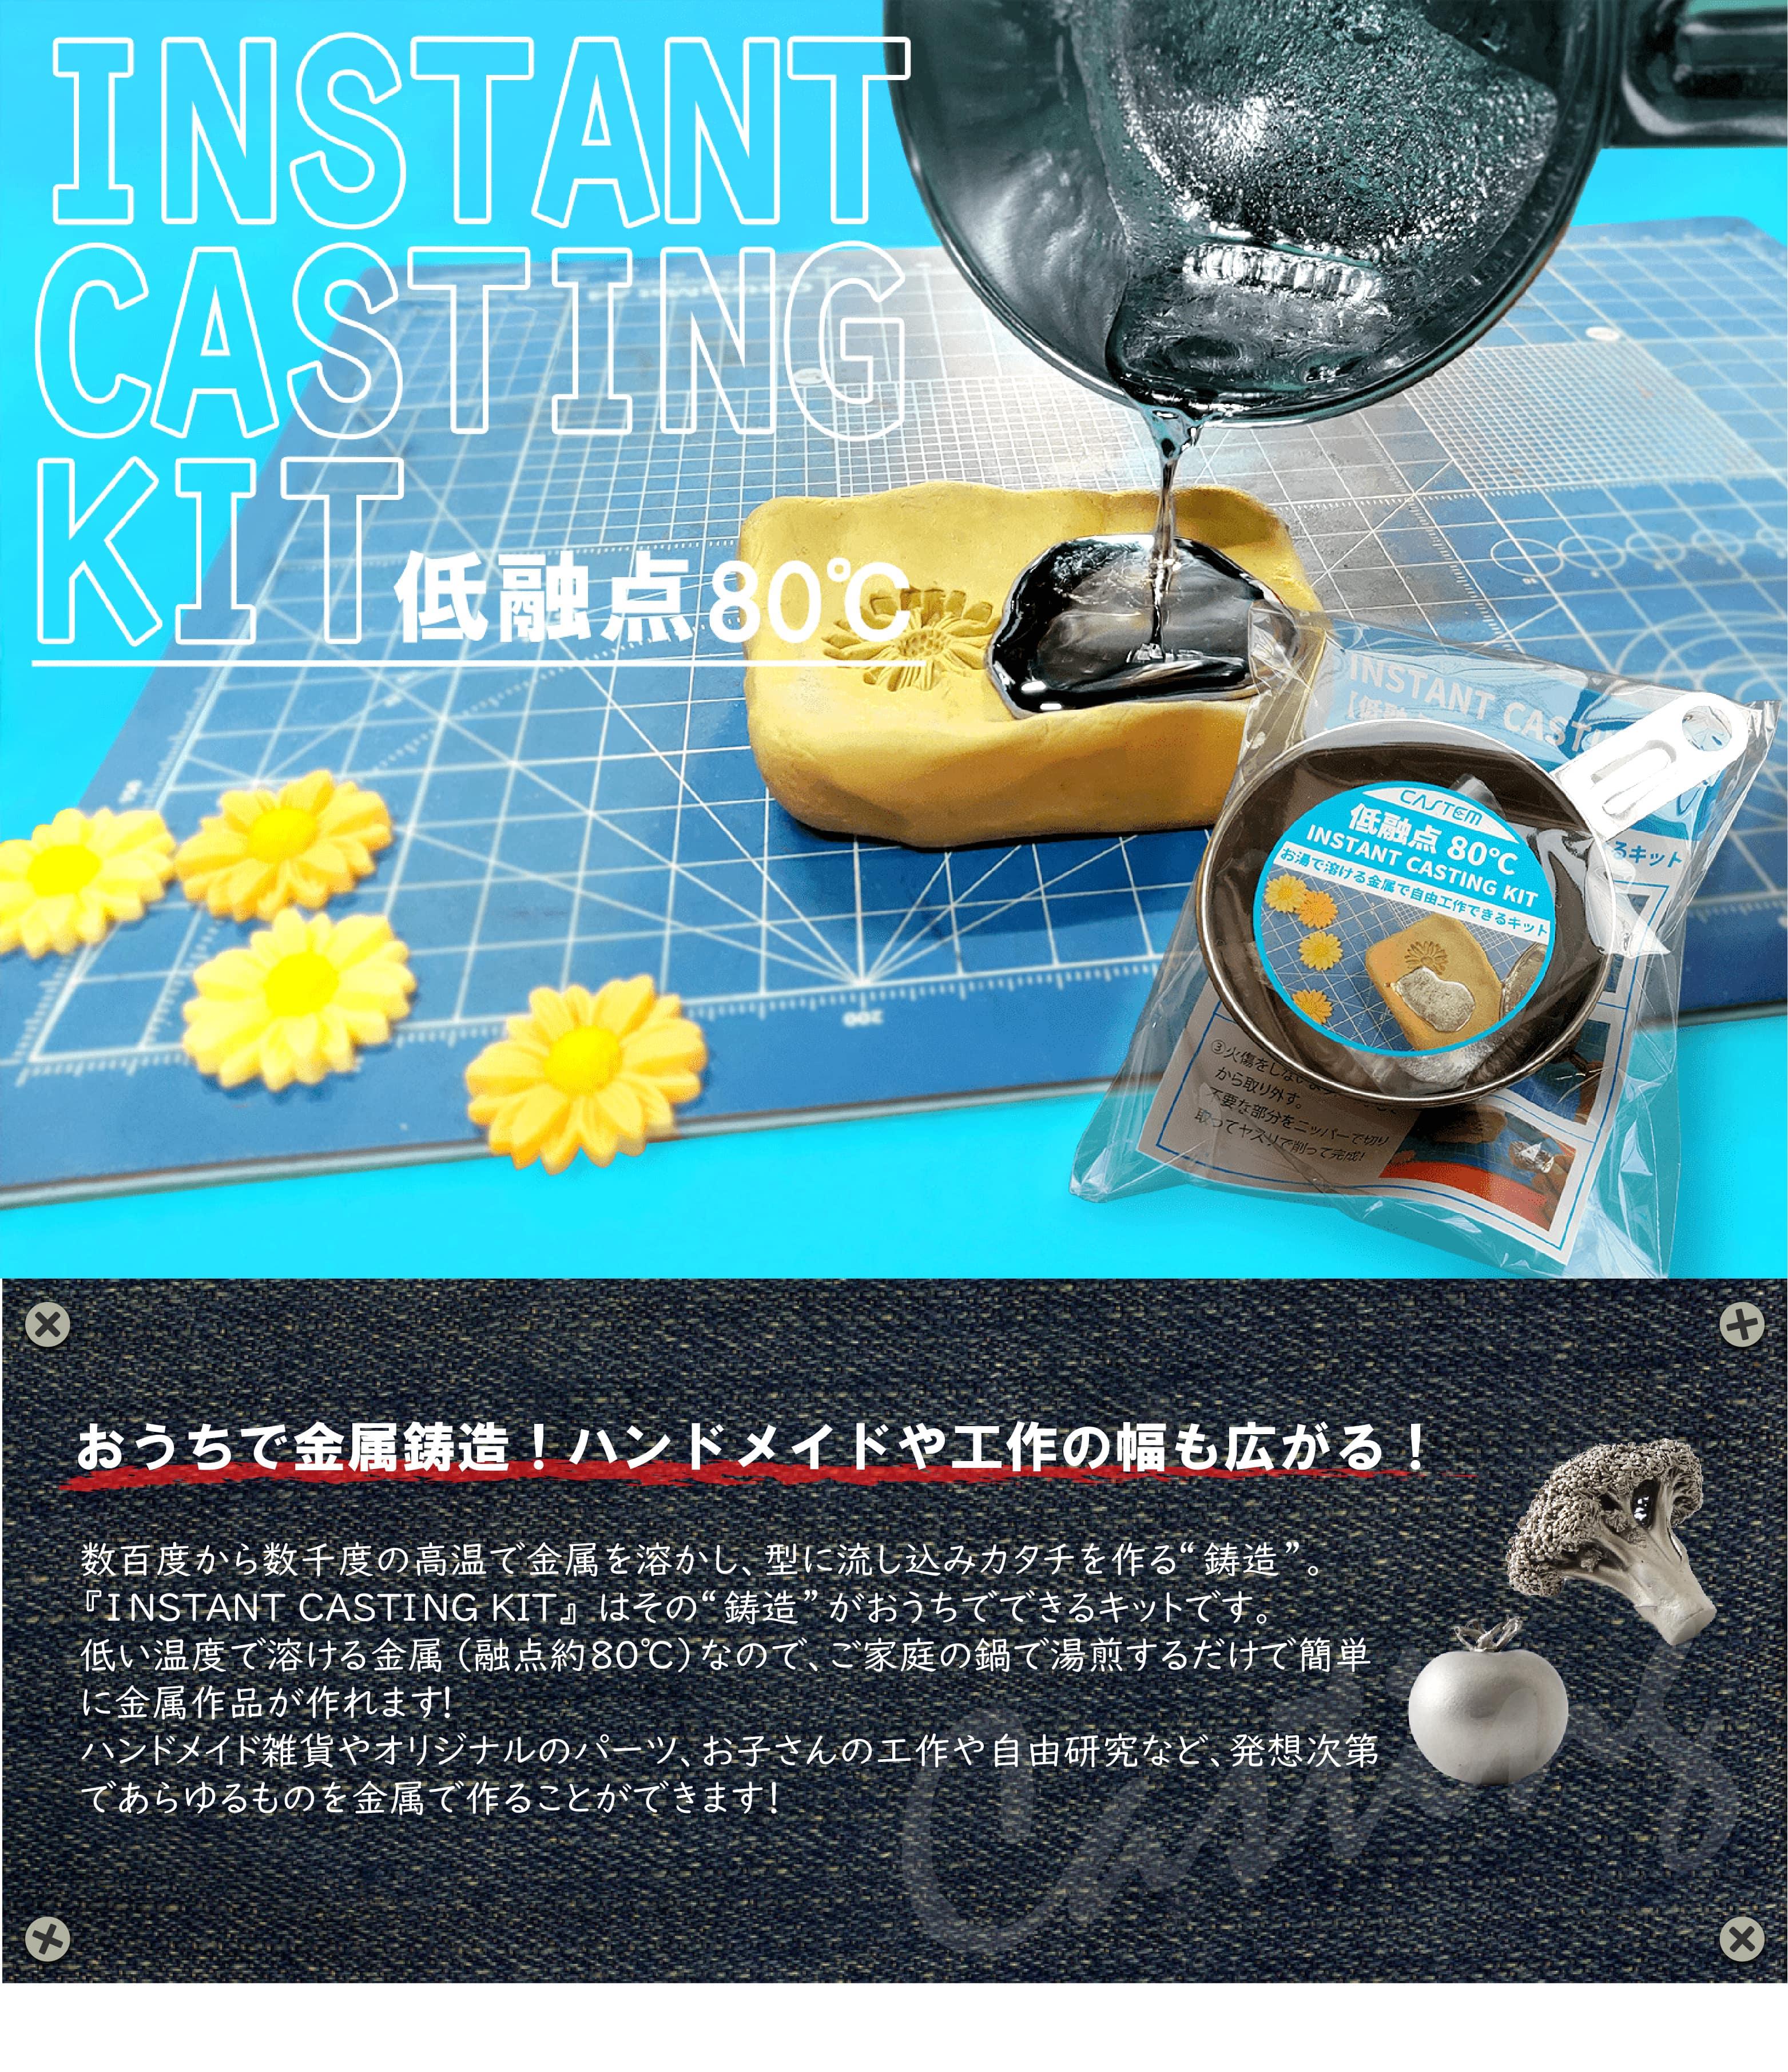 INSTANT CASTING KIT 低融点80℃―お湯で溶ける金属で自由工作できるキット―